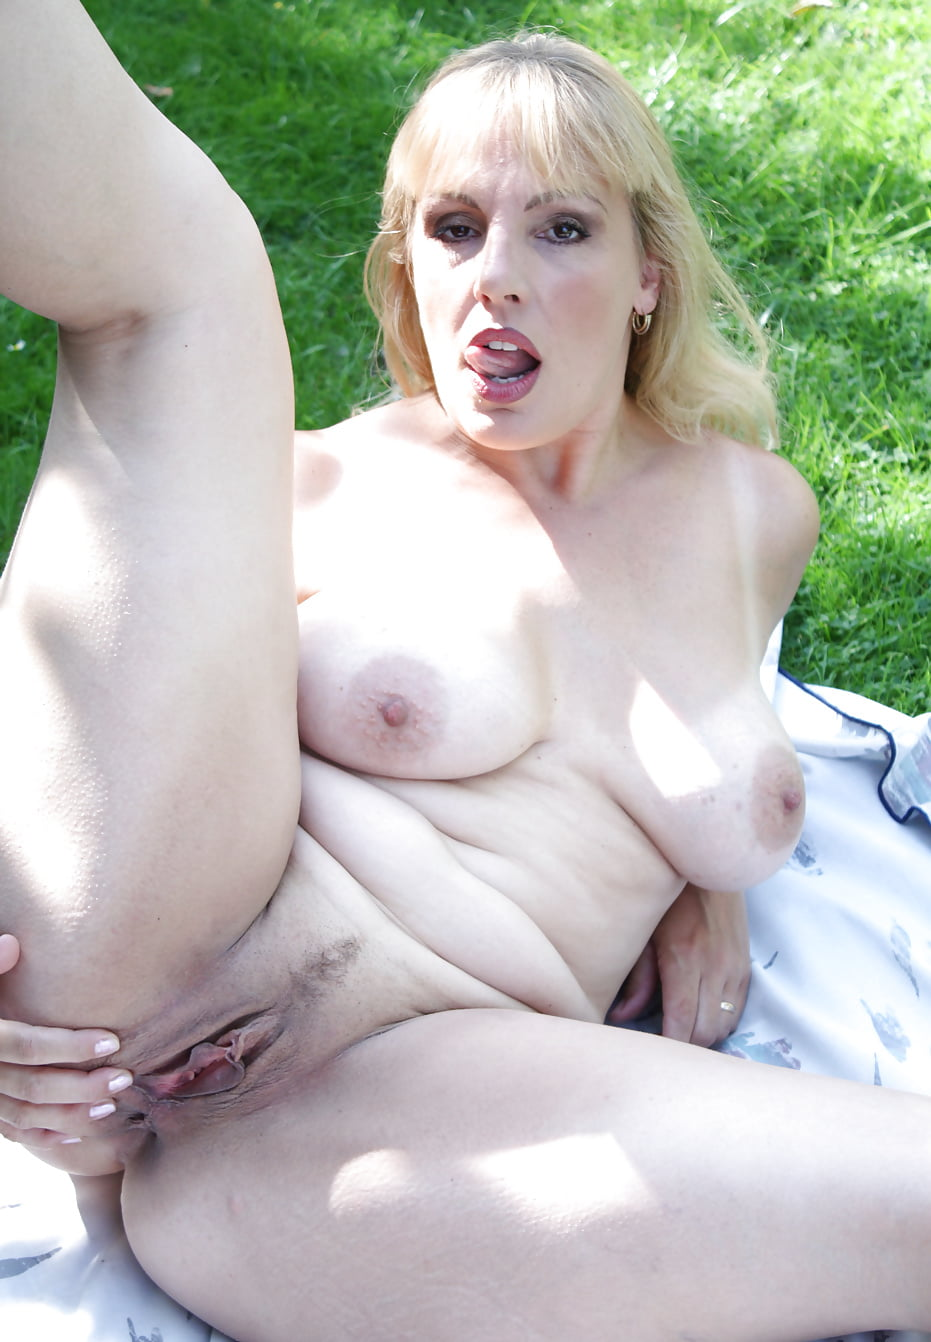 danielle-t-nude-amateur-swedish-girls